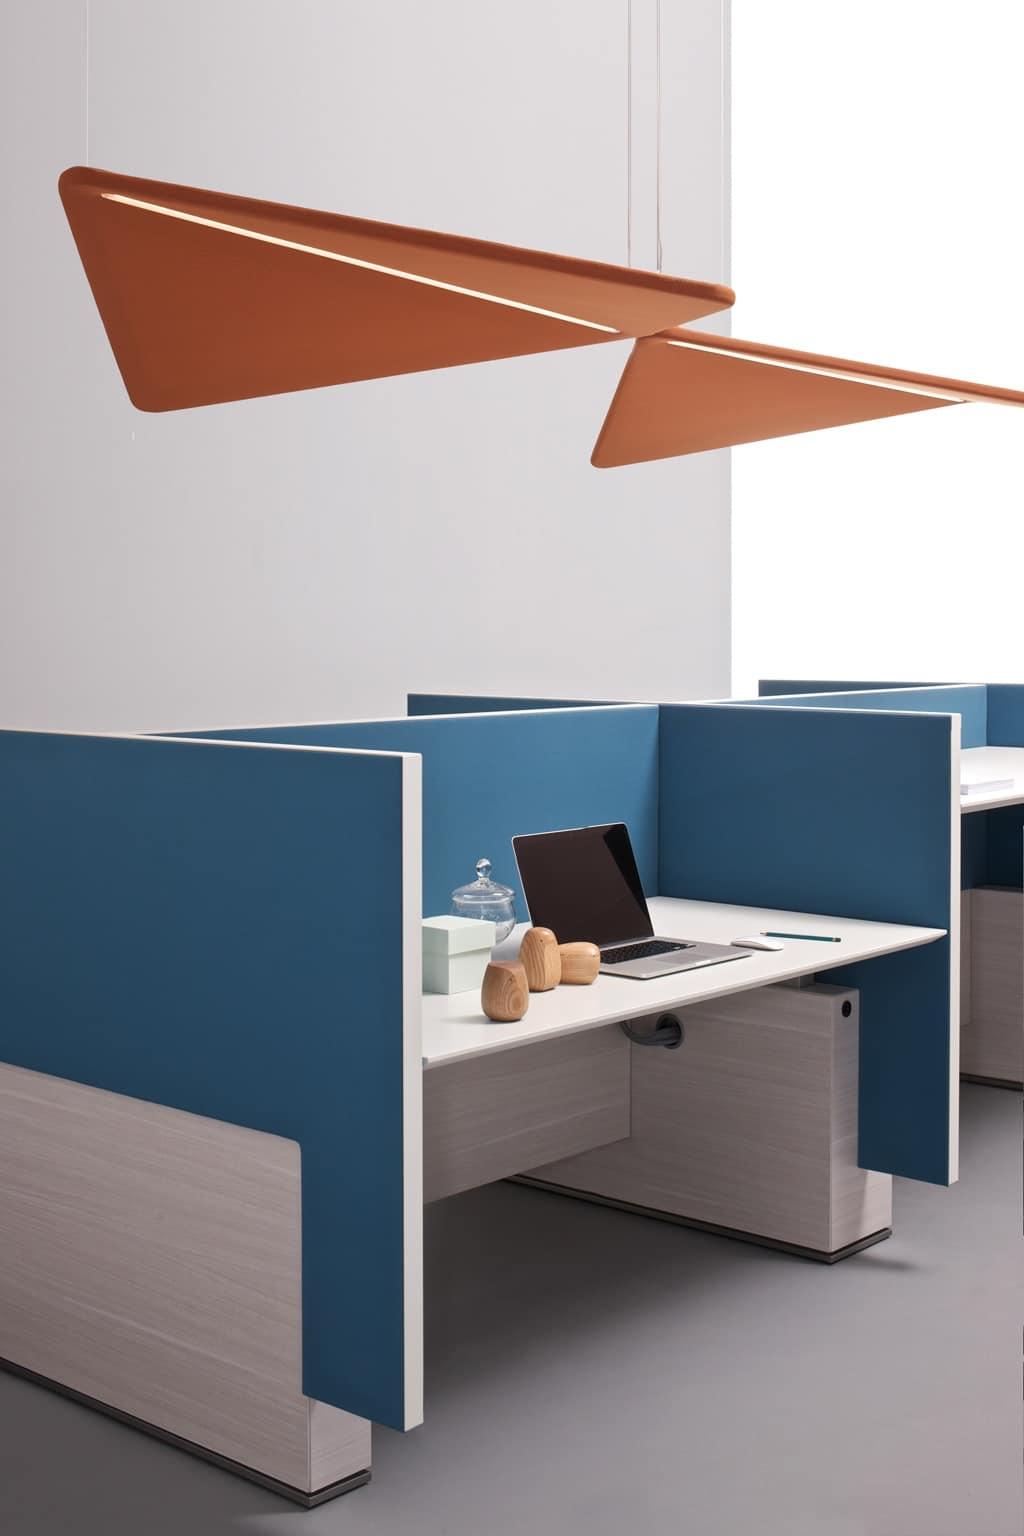 Pannelli fonoassorbenti per uffici open space e sale riunioni idfdesign - Pannelli fonoassorbenti decorativi ...